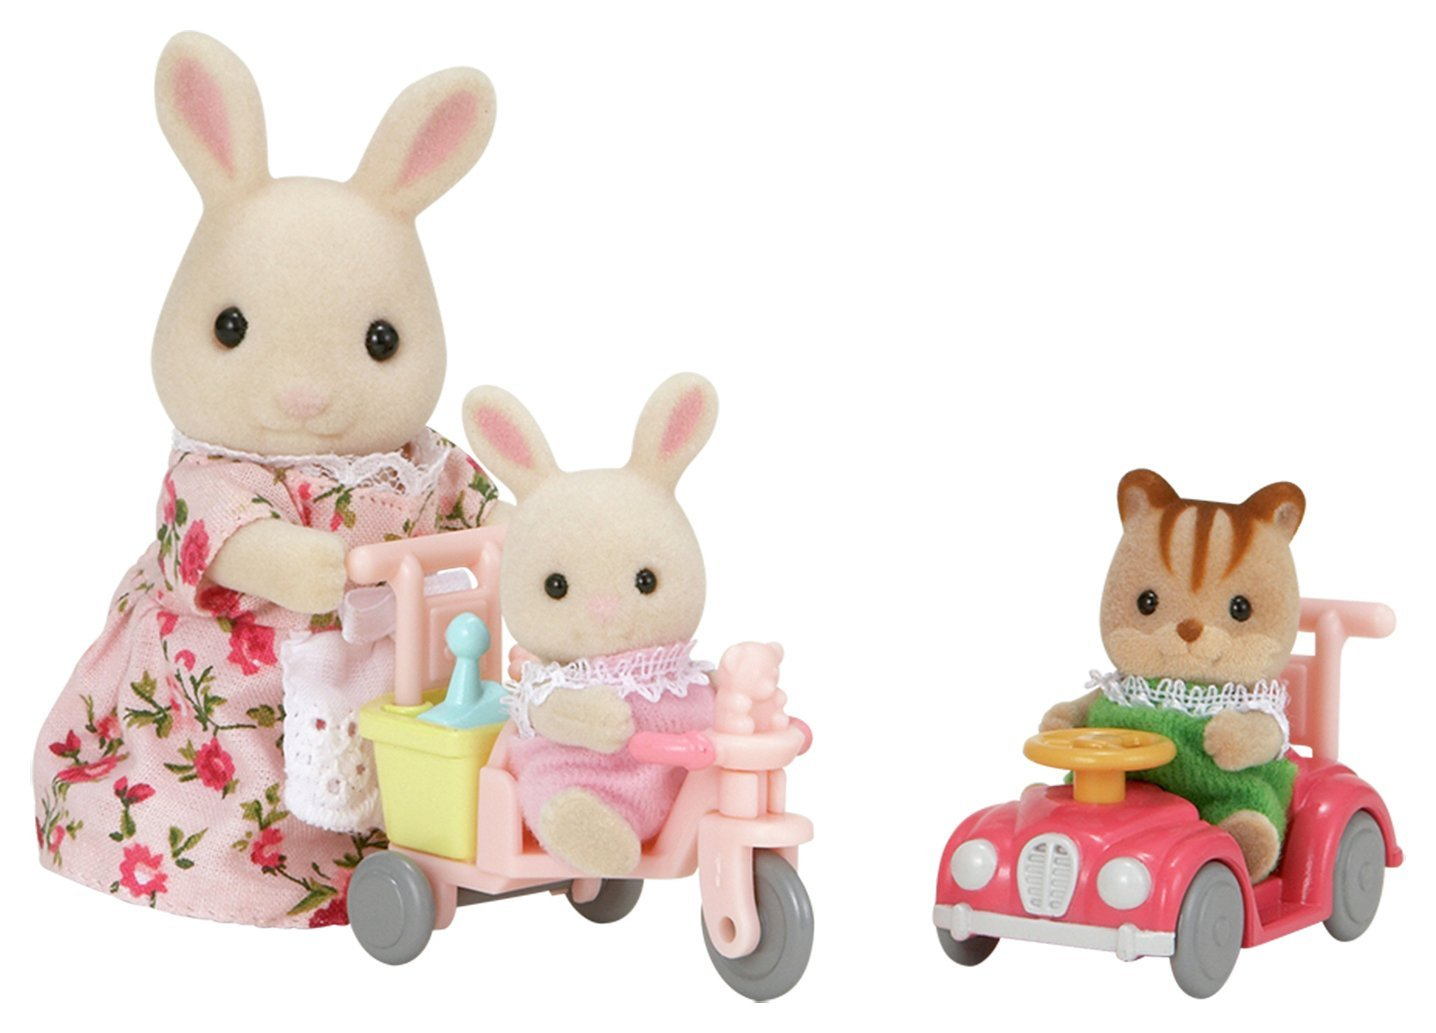 Sylvanian Families - Babies Ride and Play (5040)